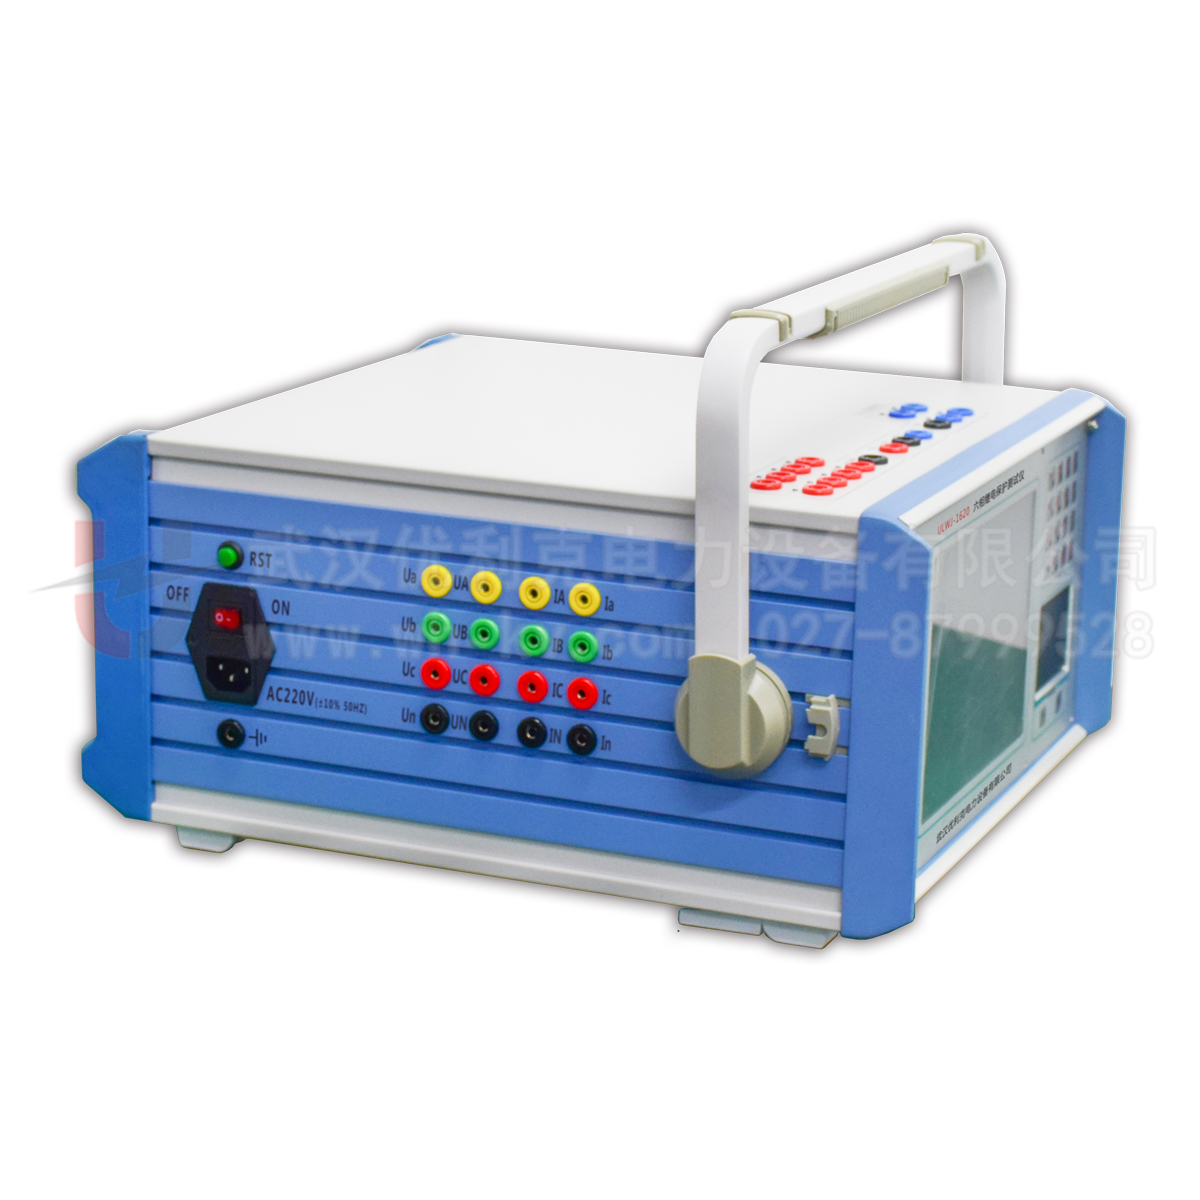 05.ULWJ-1620六相继电保护测试仪